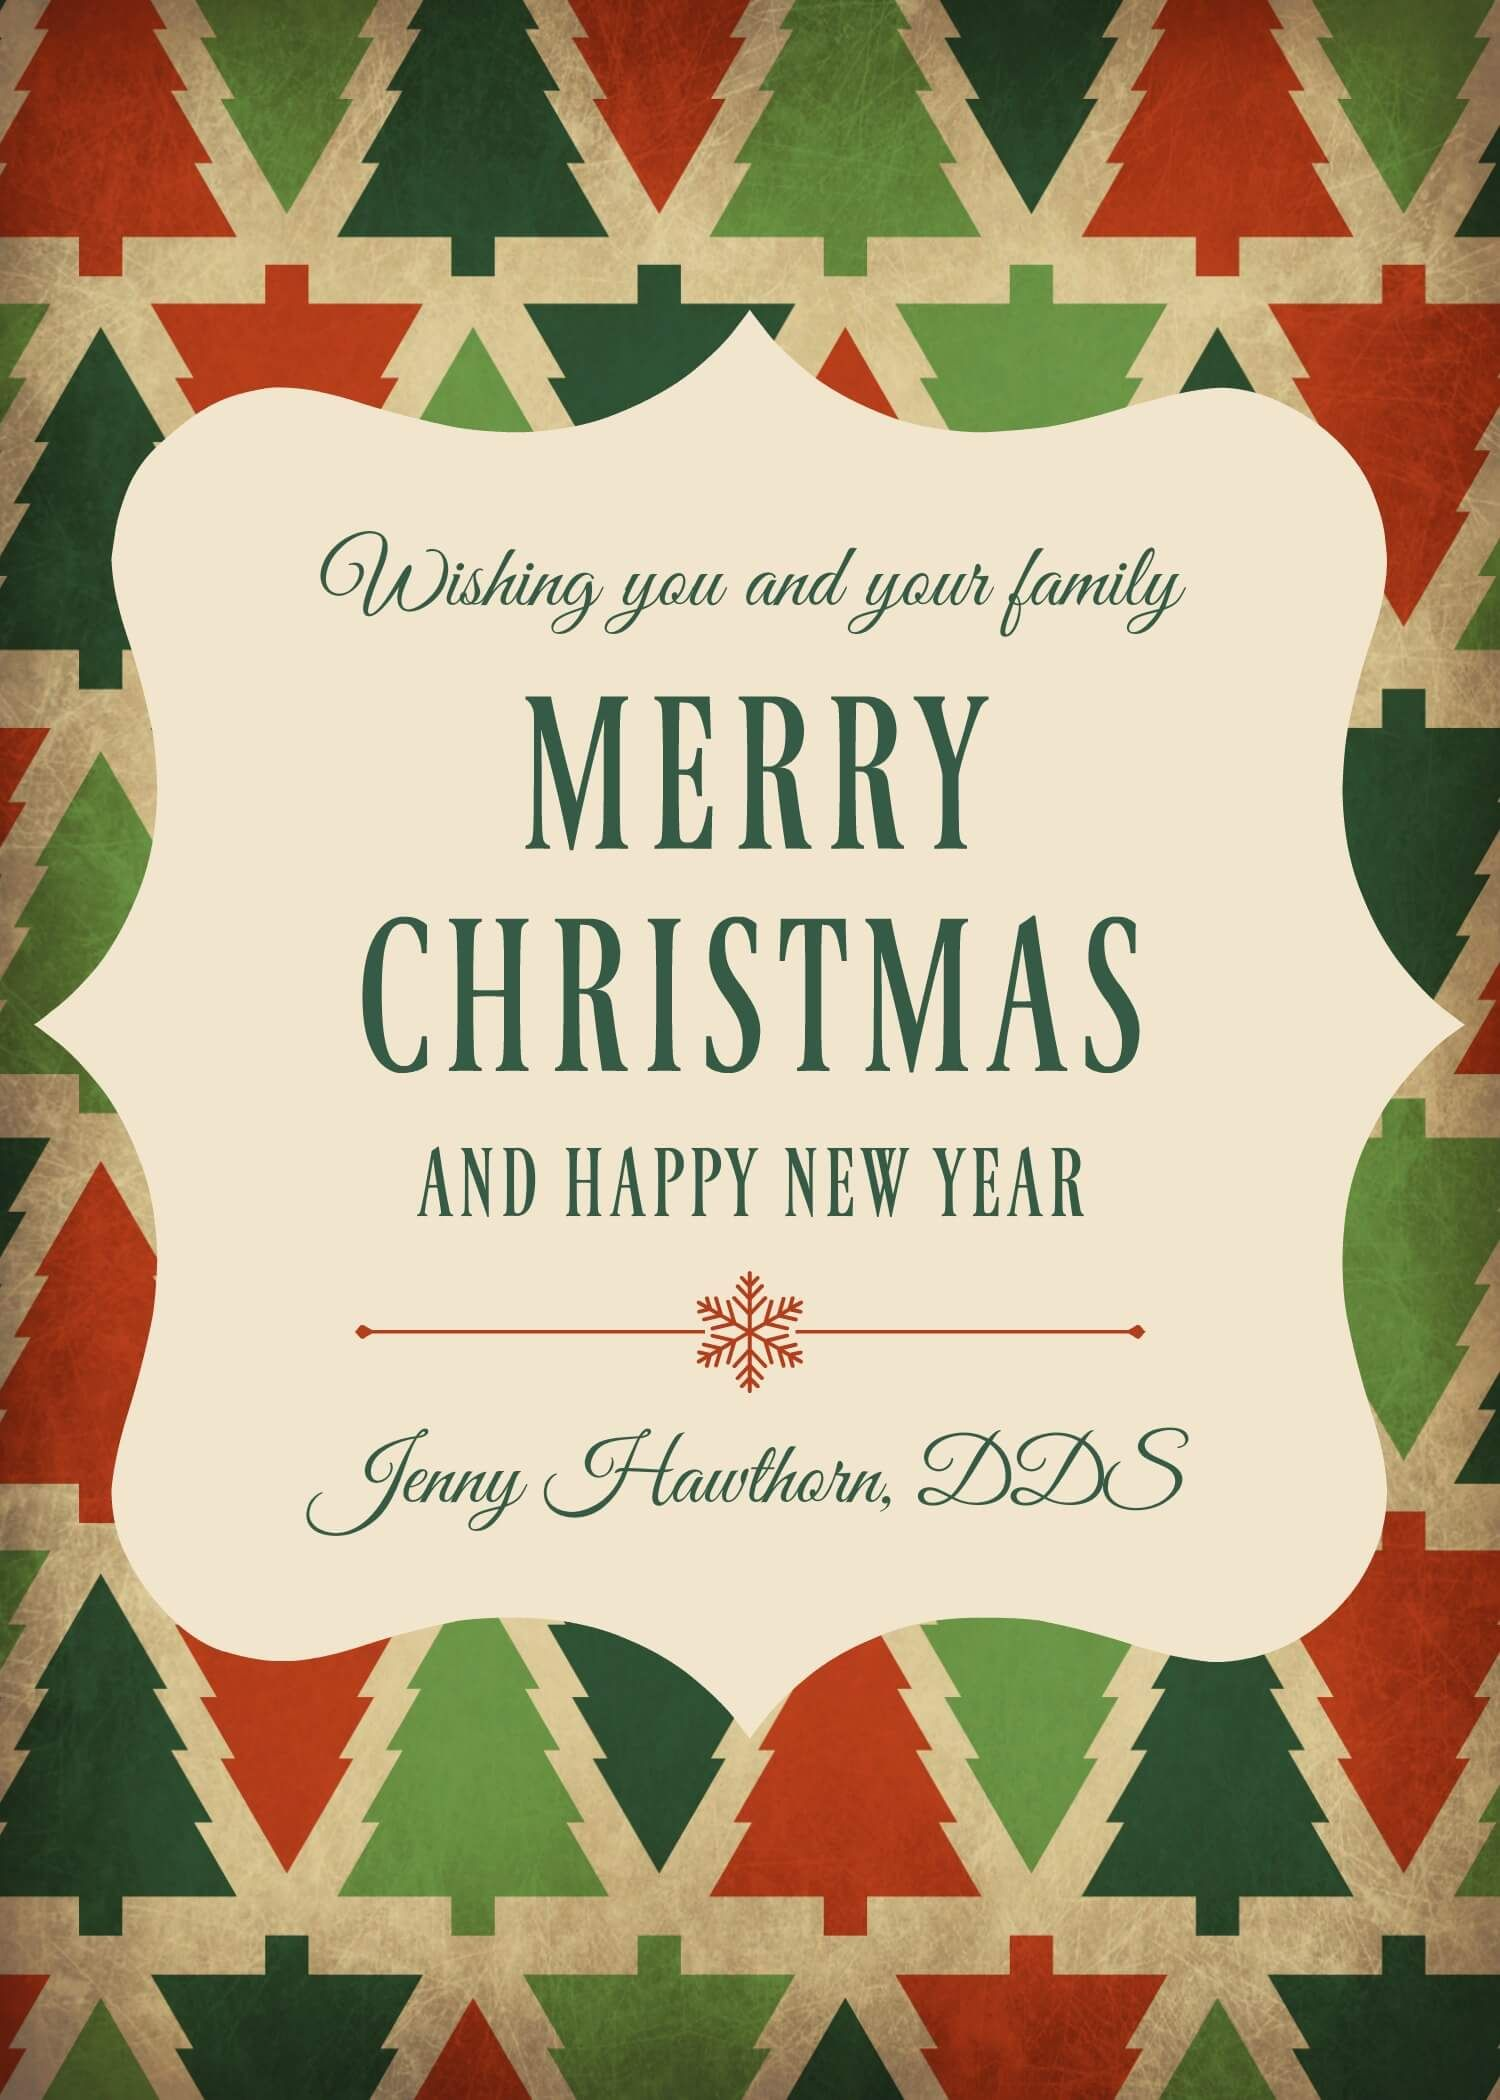 Christmas Card Christmas Card Sayings Professional Picmonkey Templates Christmas Card Messages Xmas Card Greetings Christmas Card Sayings